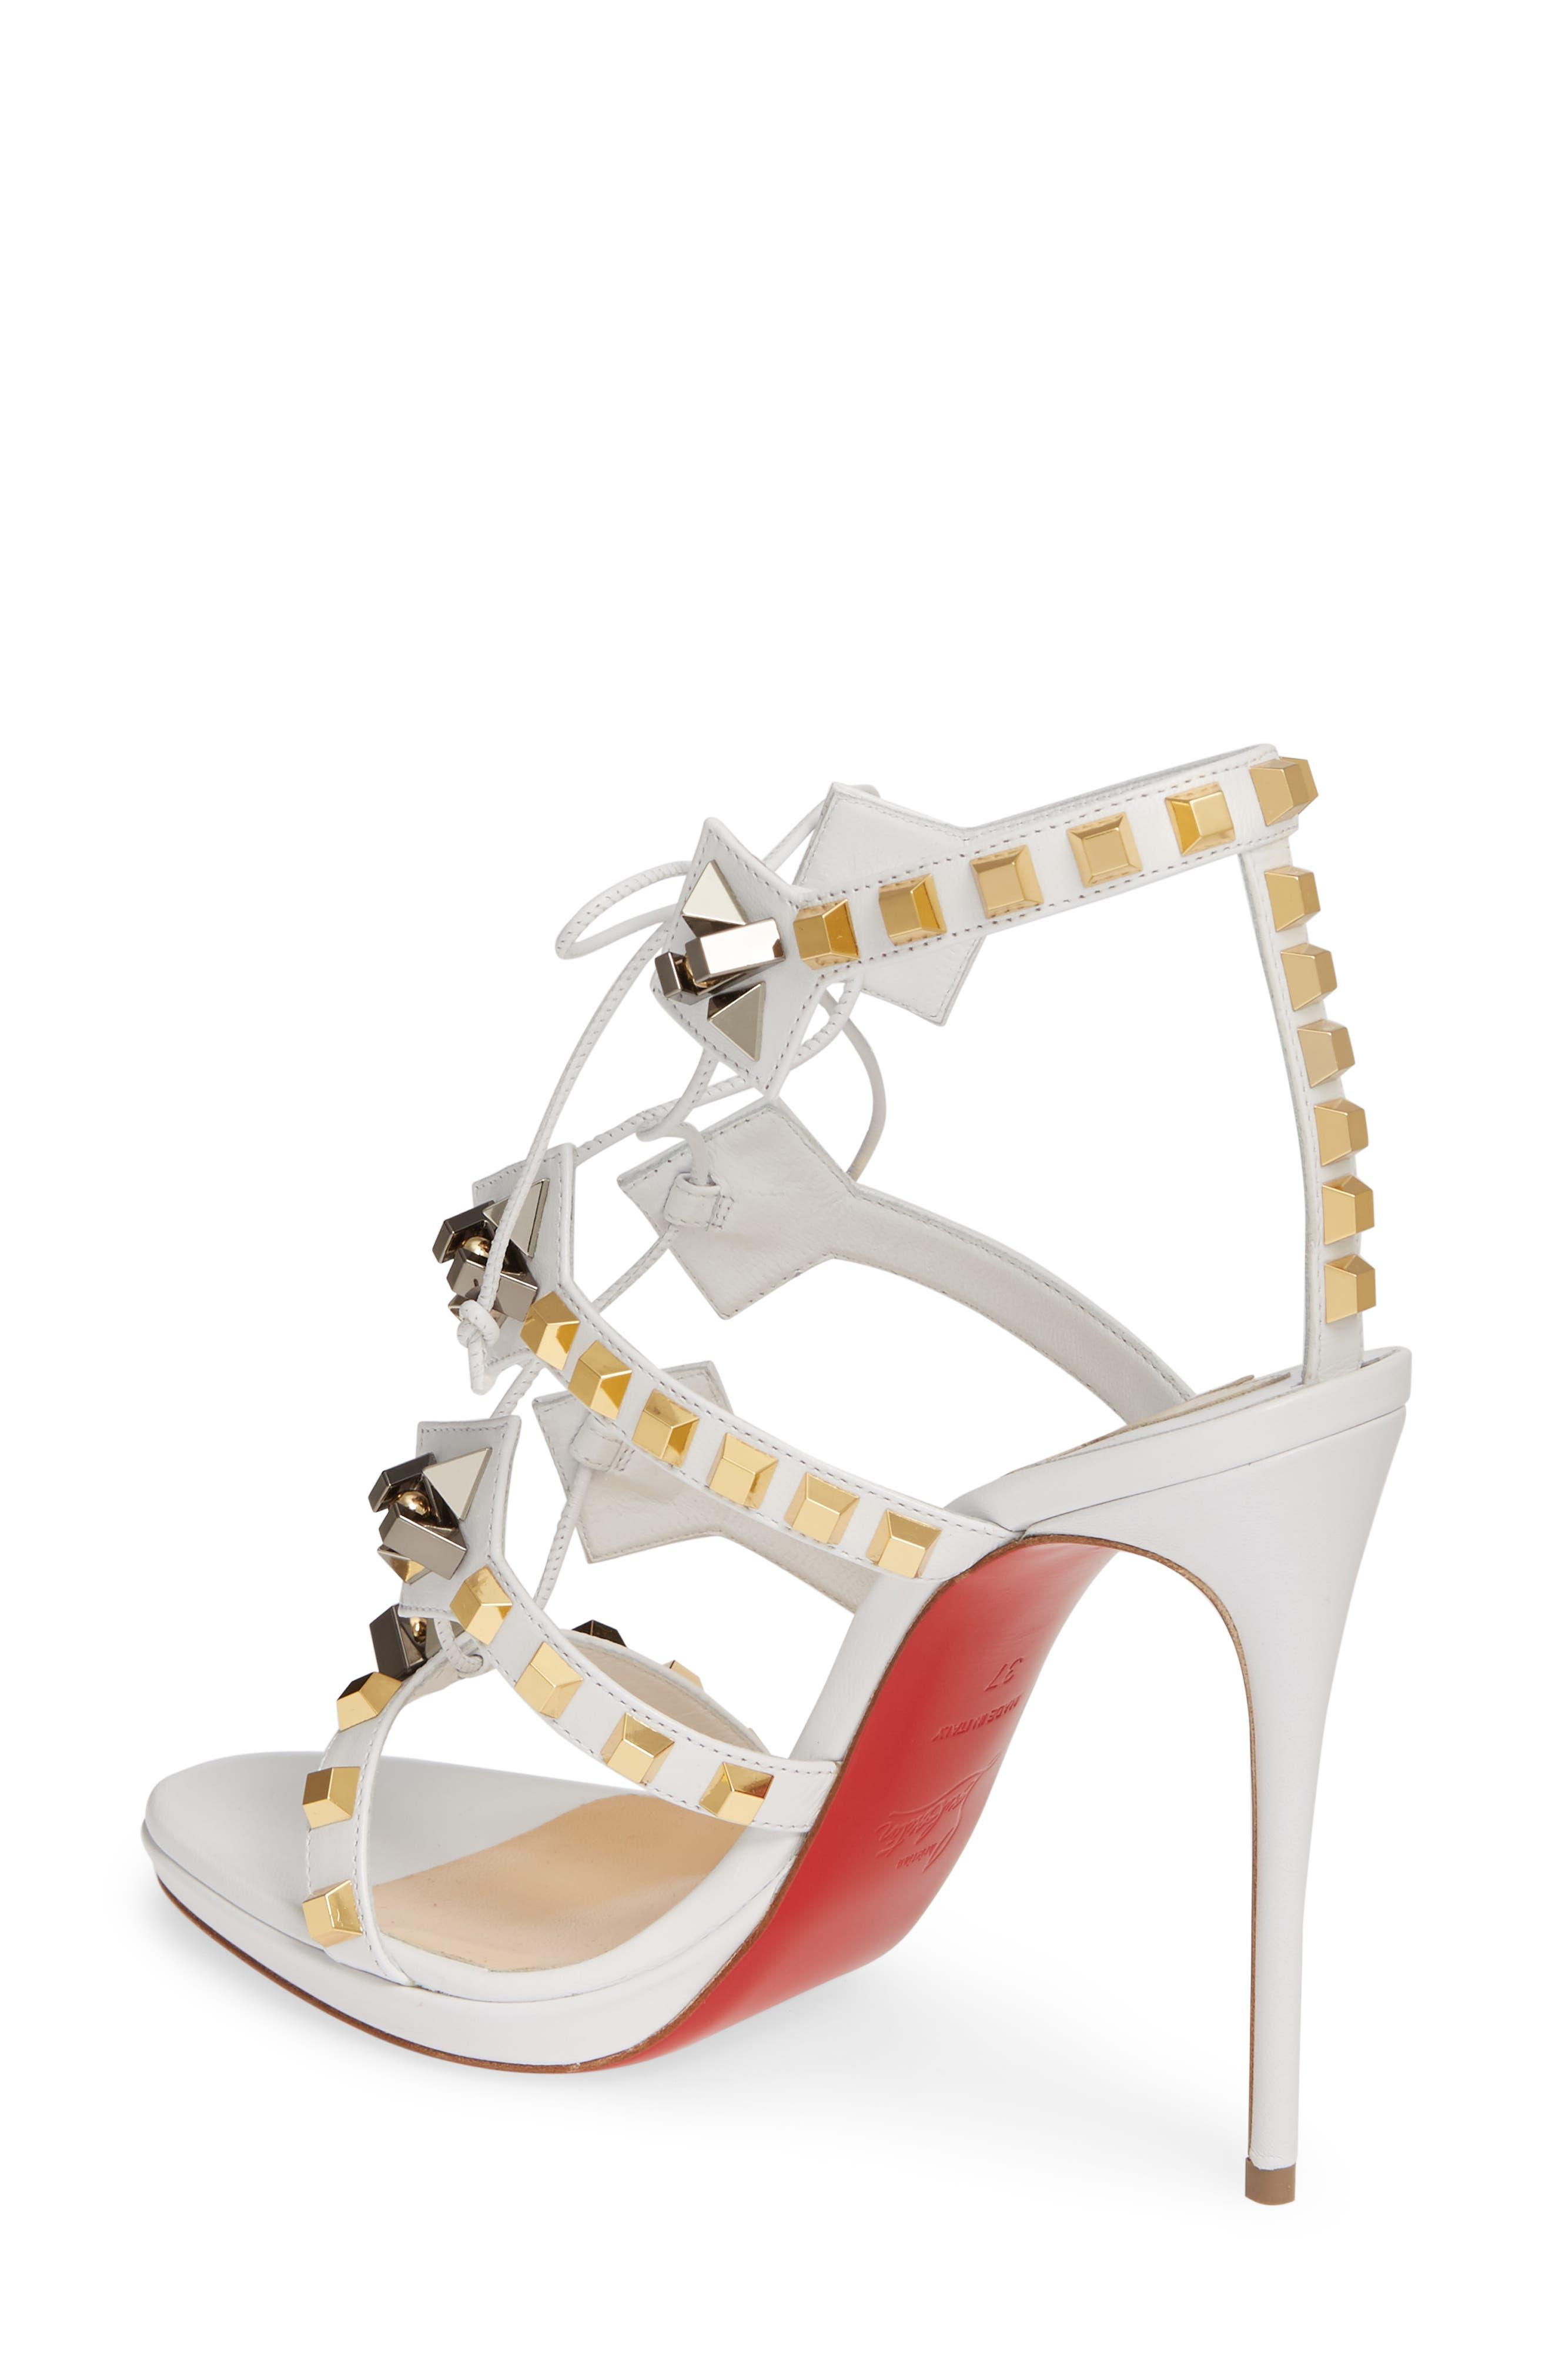 9ed90084c0d Christian Louboutin Women s Gladiator Shoes